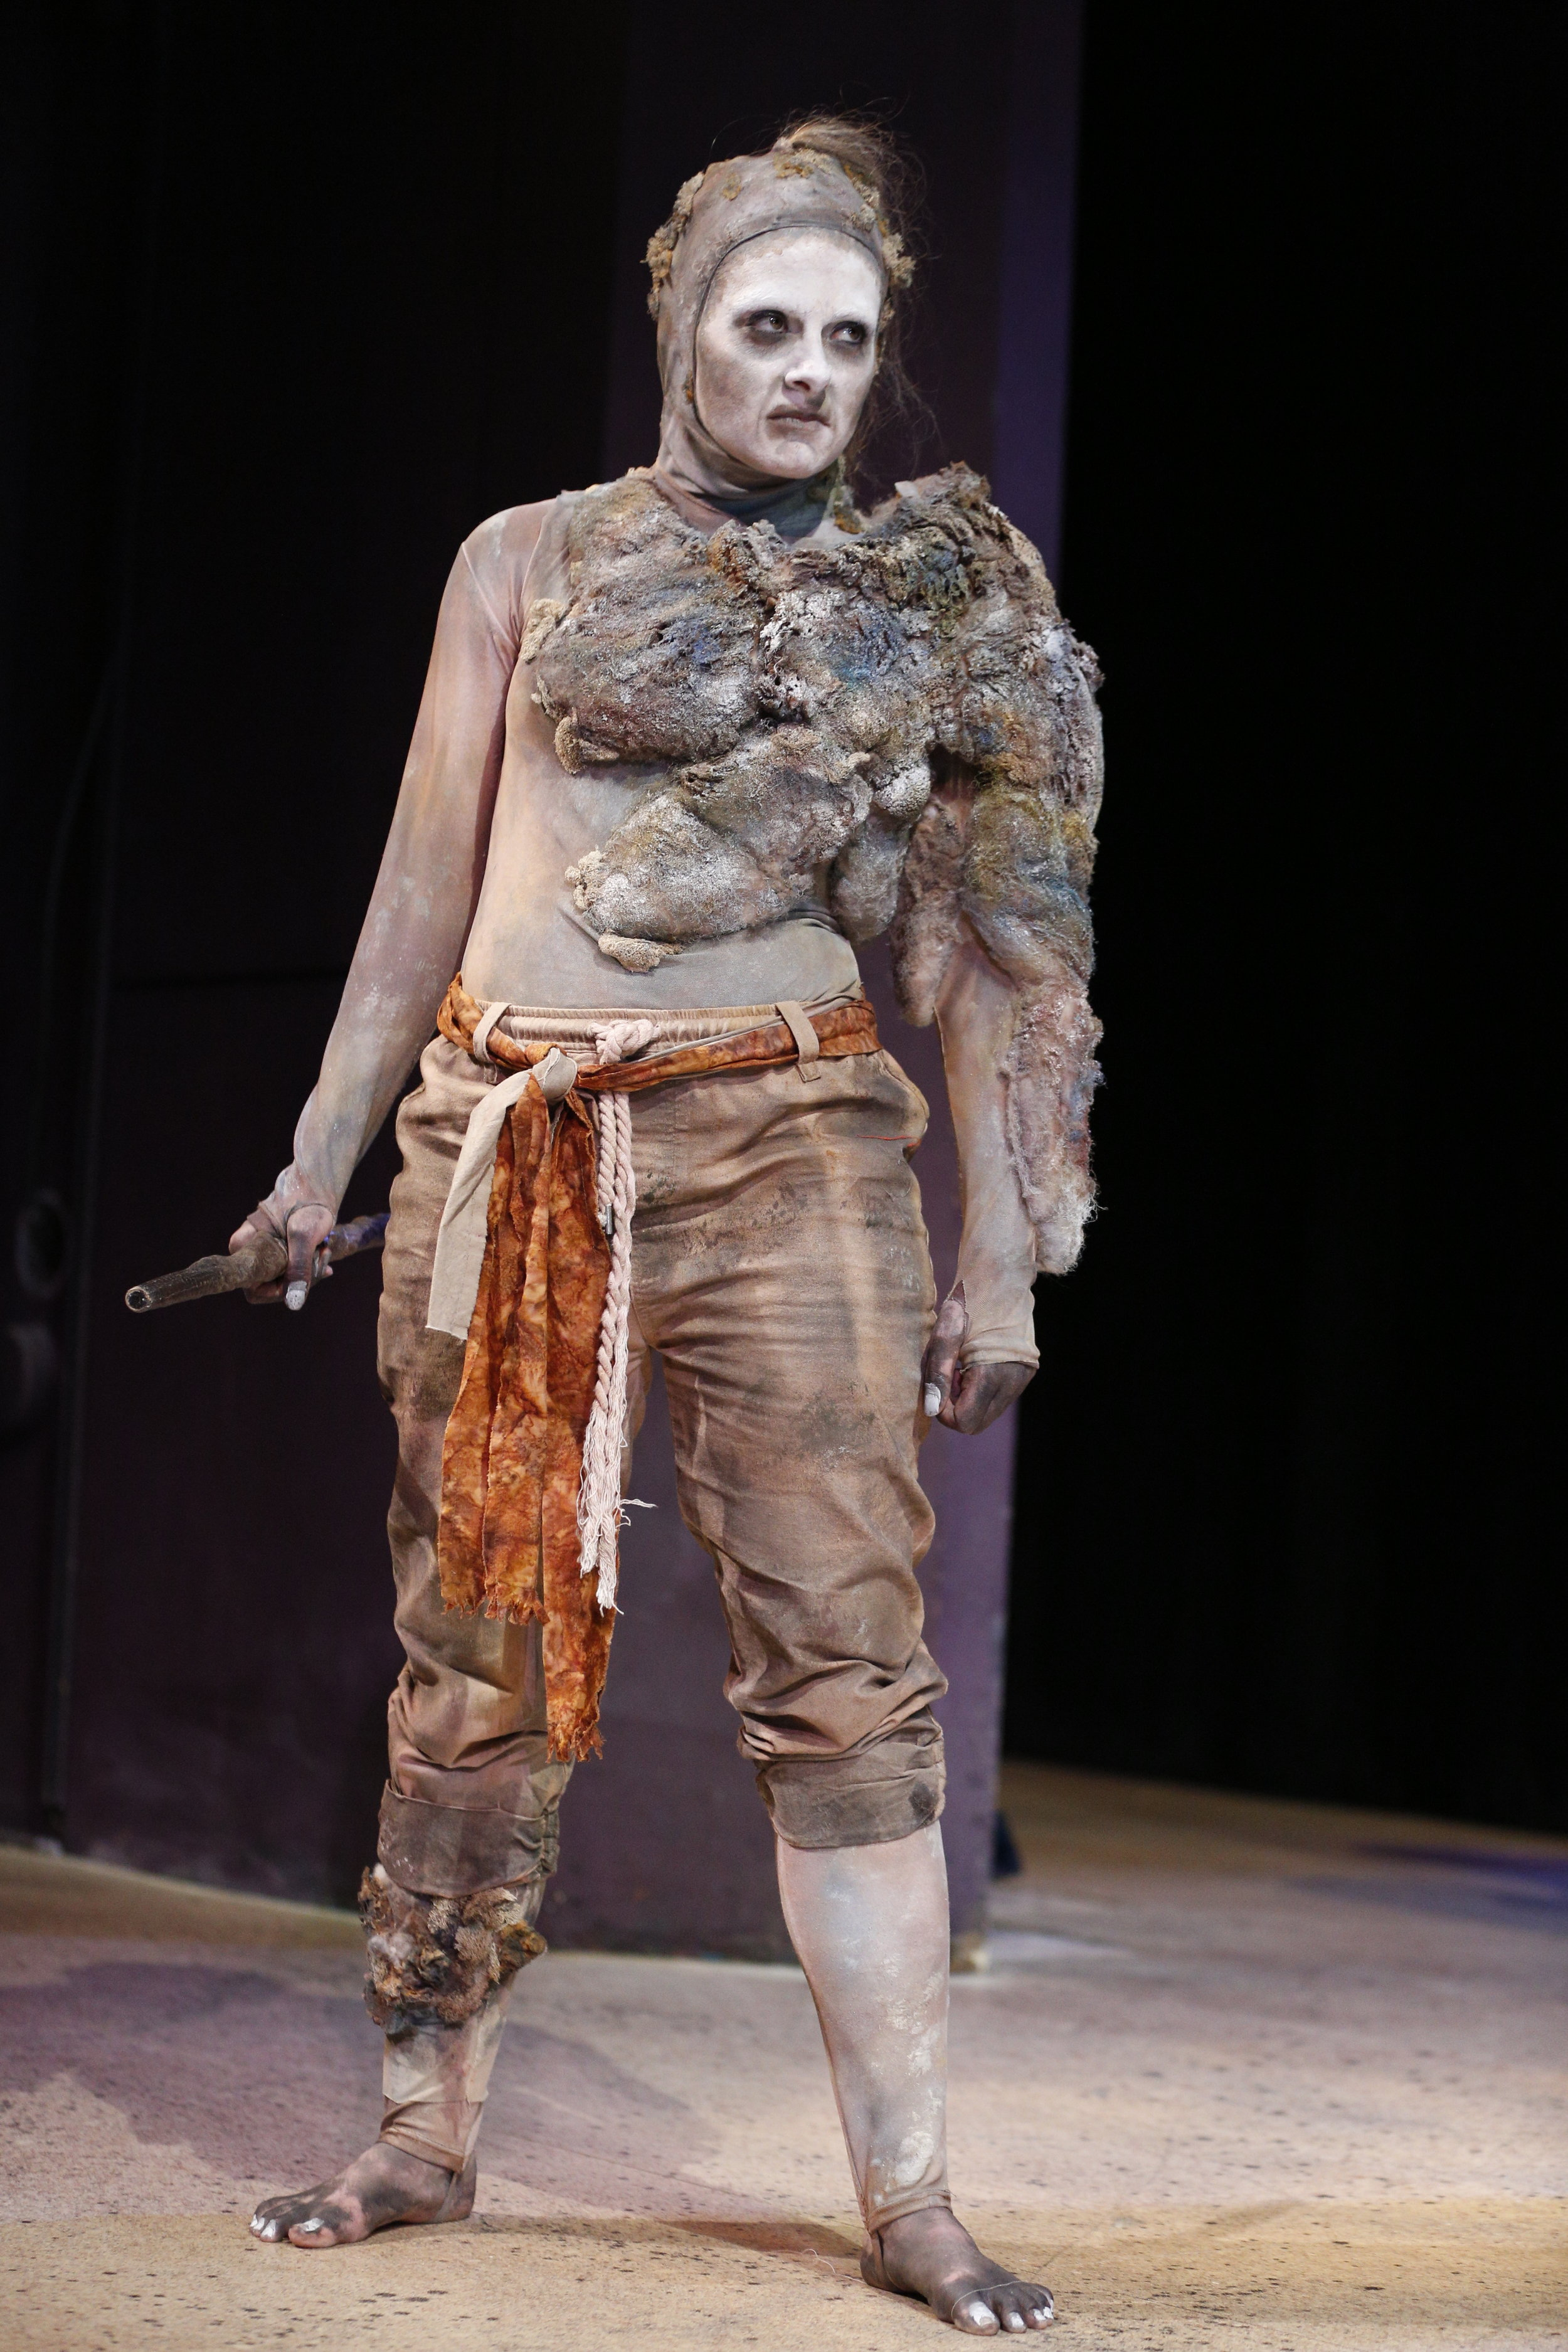 Ashley Dillard as Caliban photo by:Jeremy Hogan